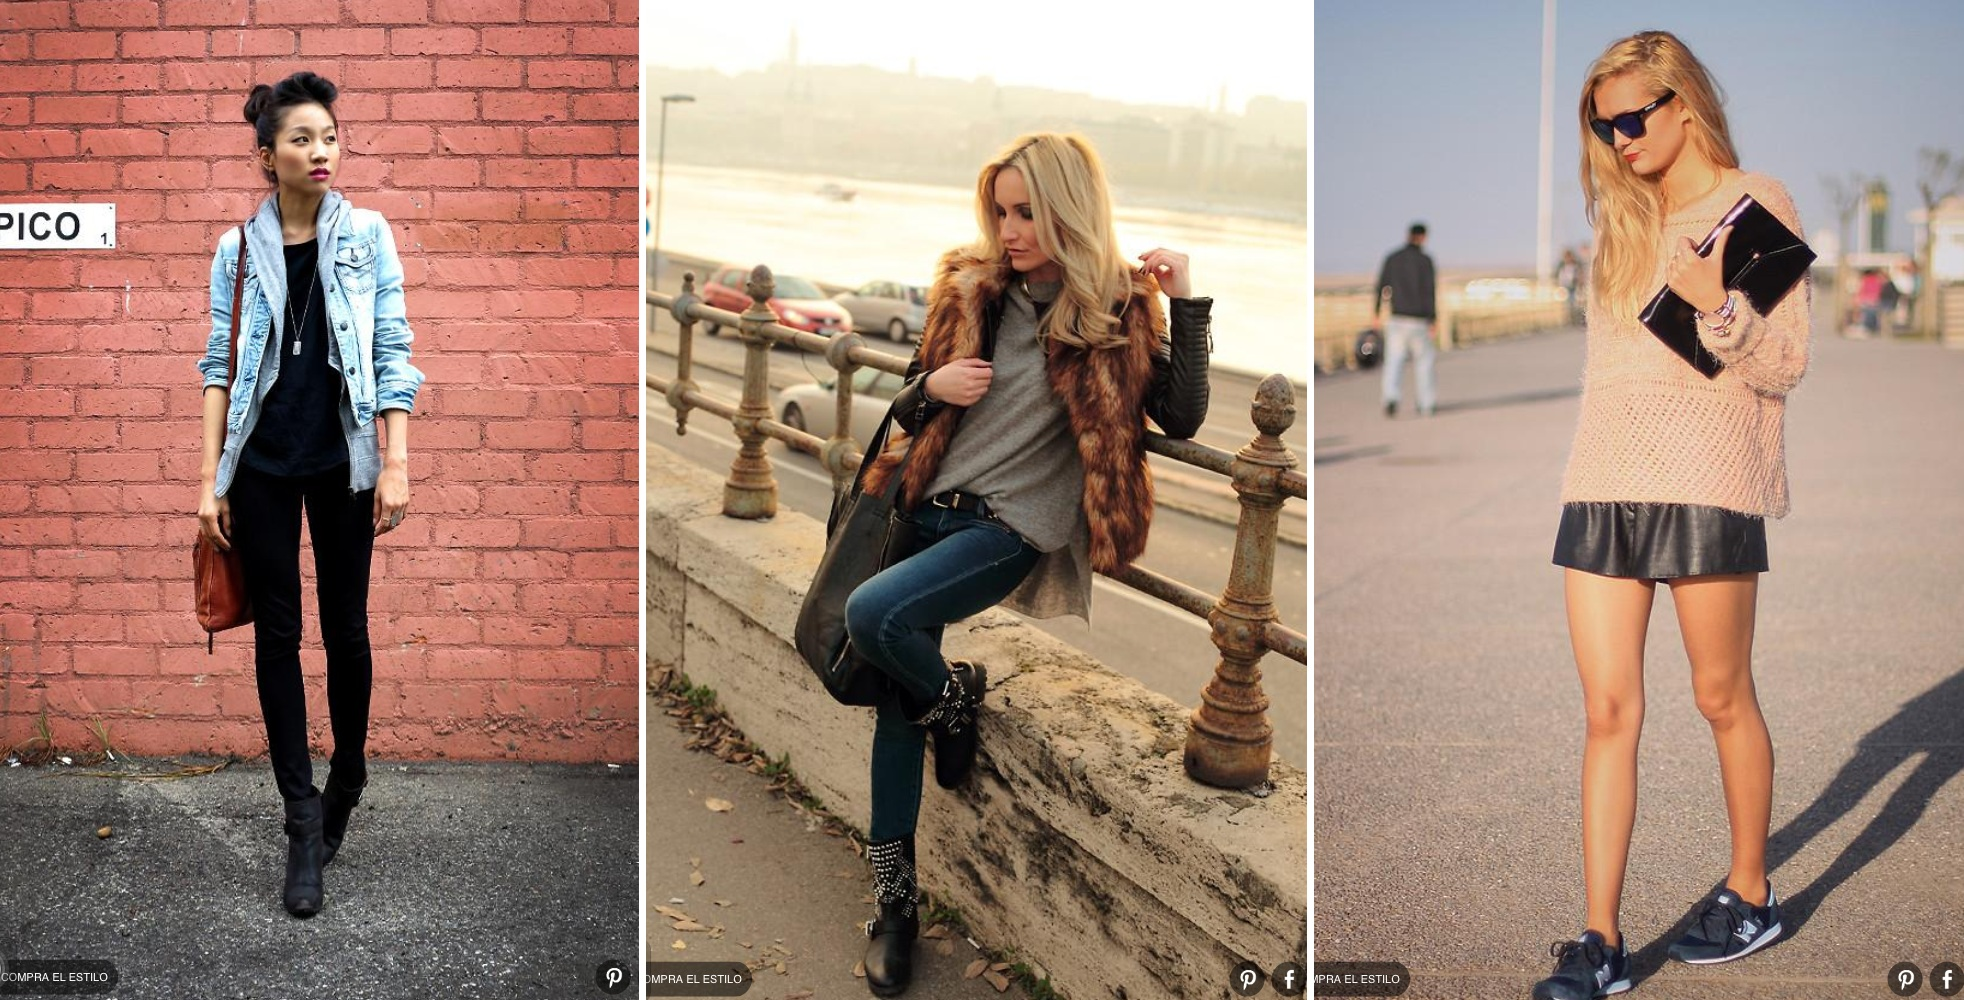 Pics of inspiration-48647-